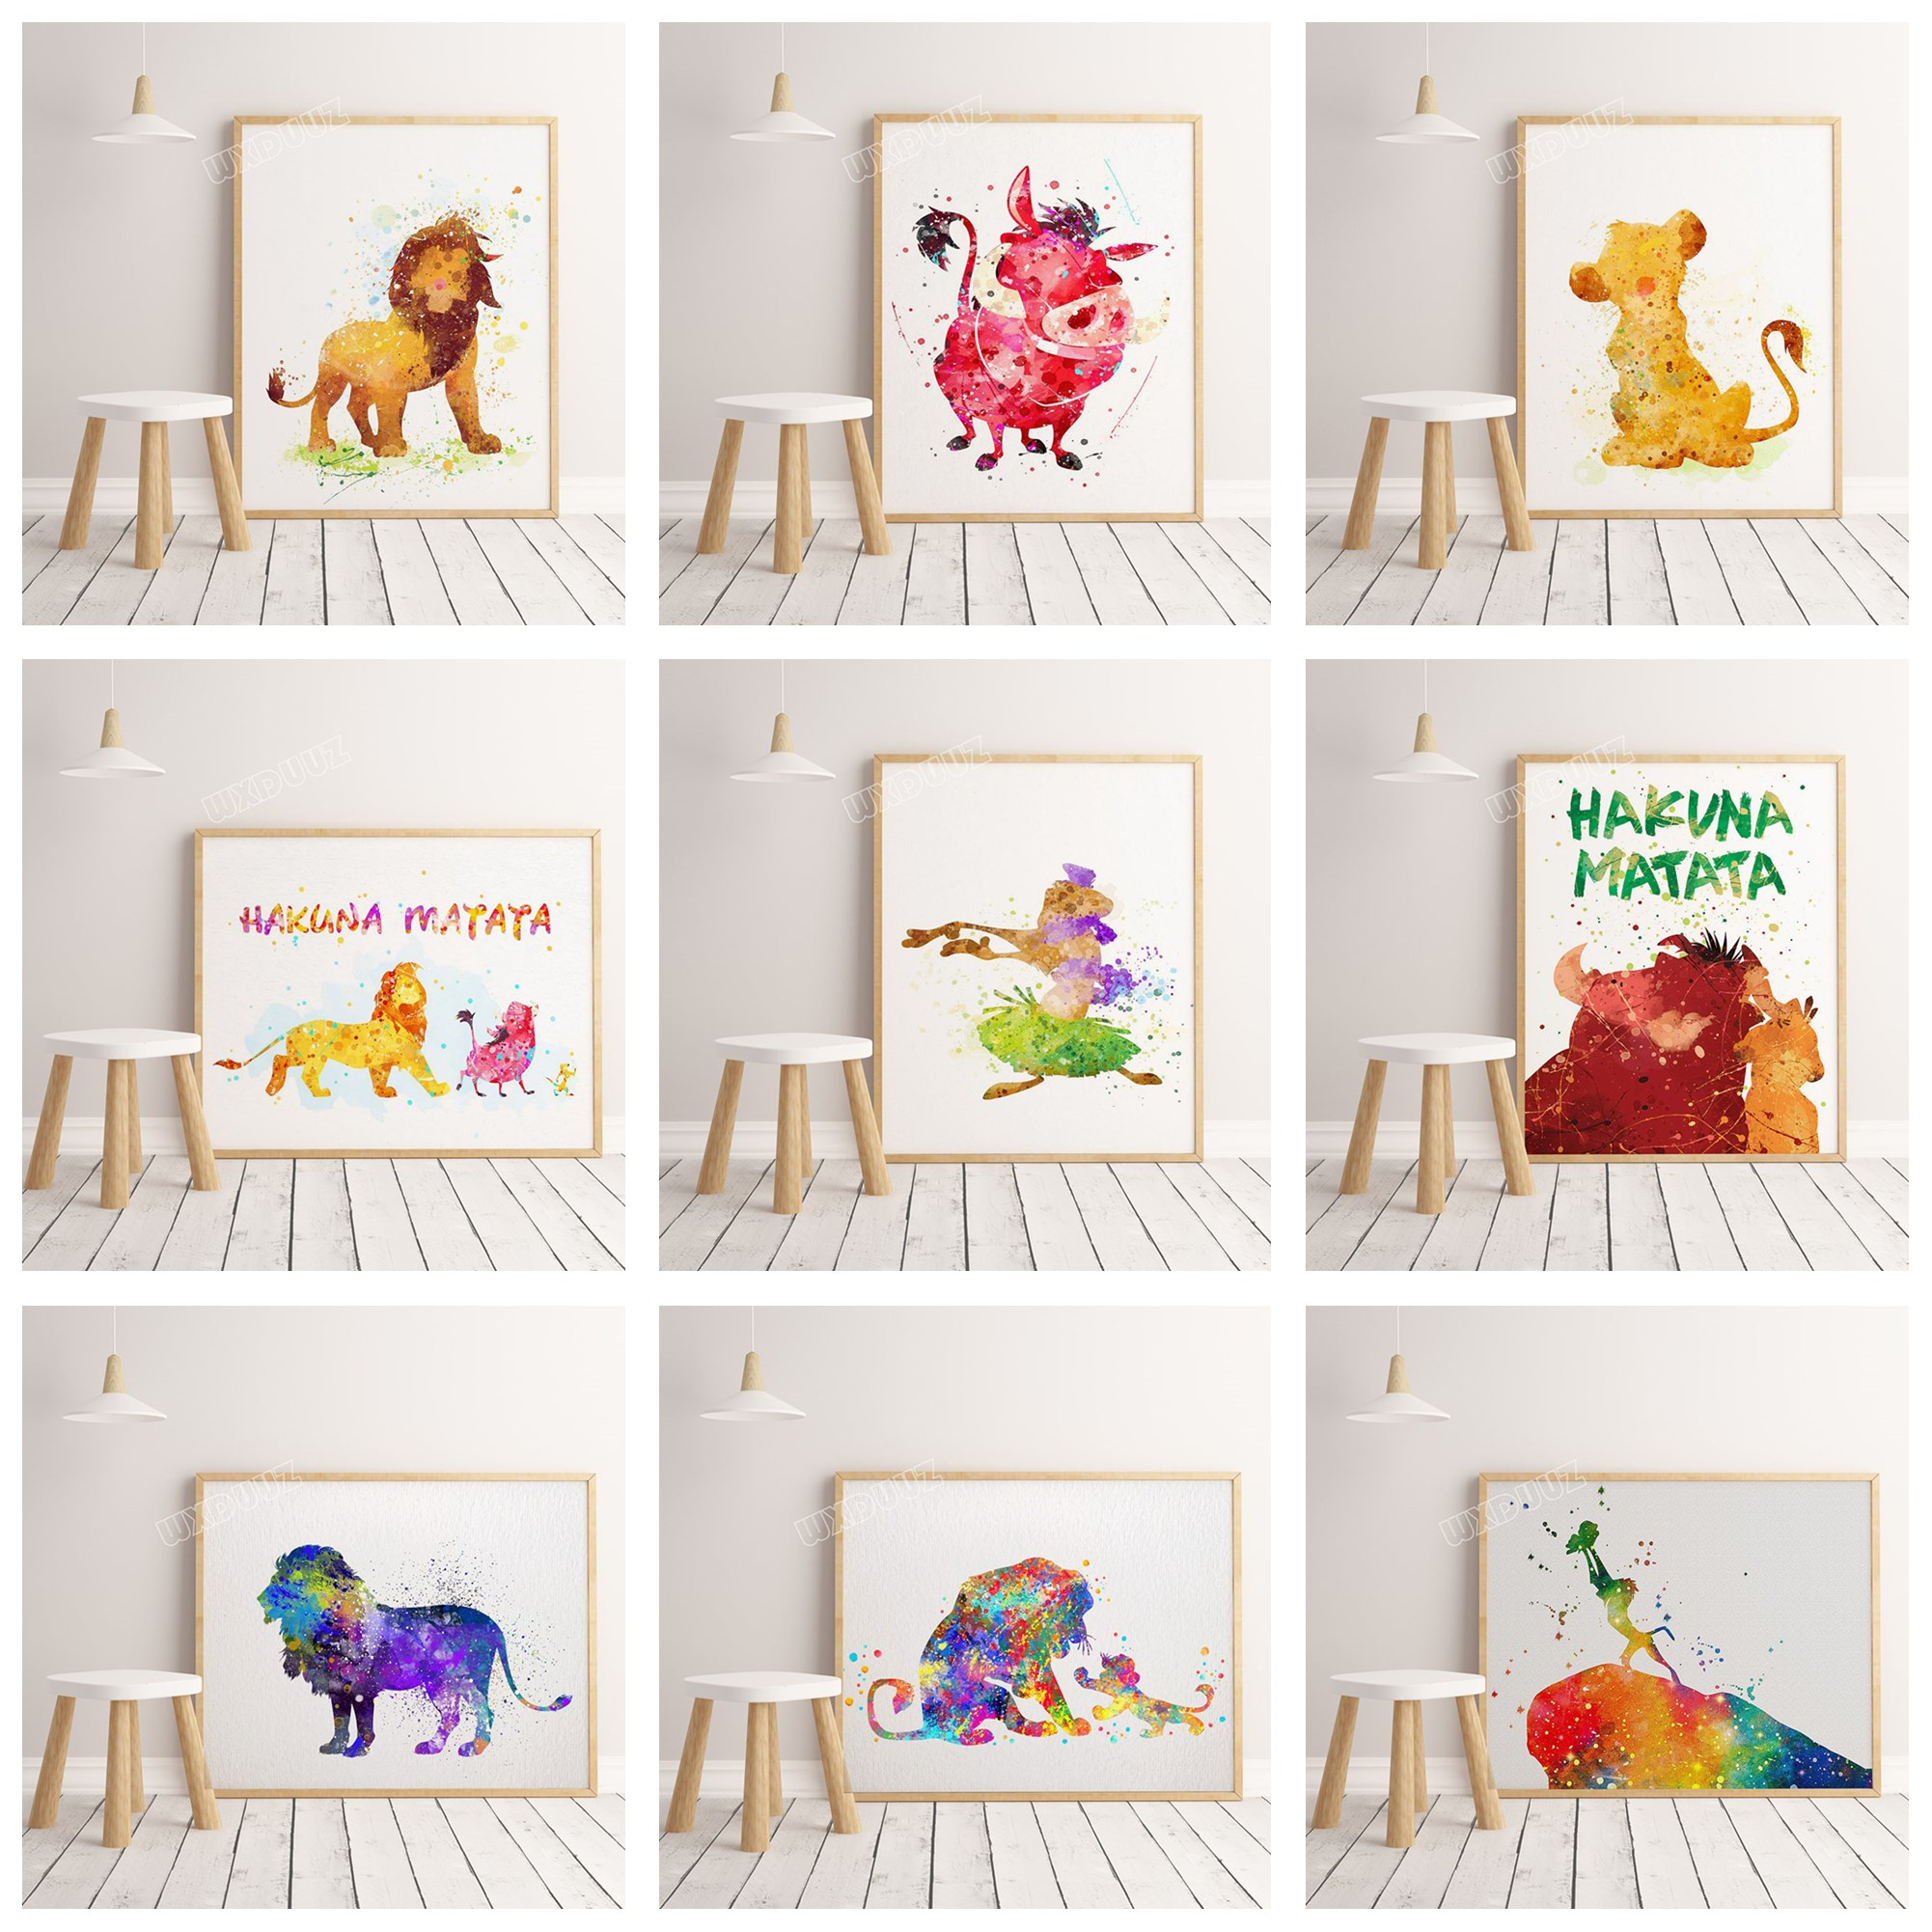 >2019 <font><b>watercolor</b></font> movie The Lion King poster cartoon children room decoration Art Decor <font><b>Home</b></font> Decor Painting canvas painting #K293